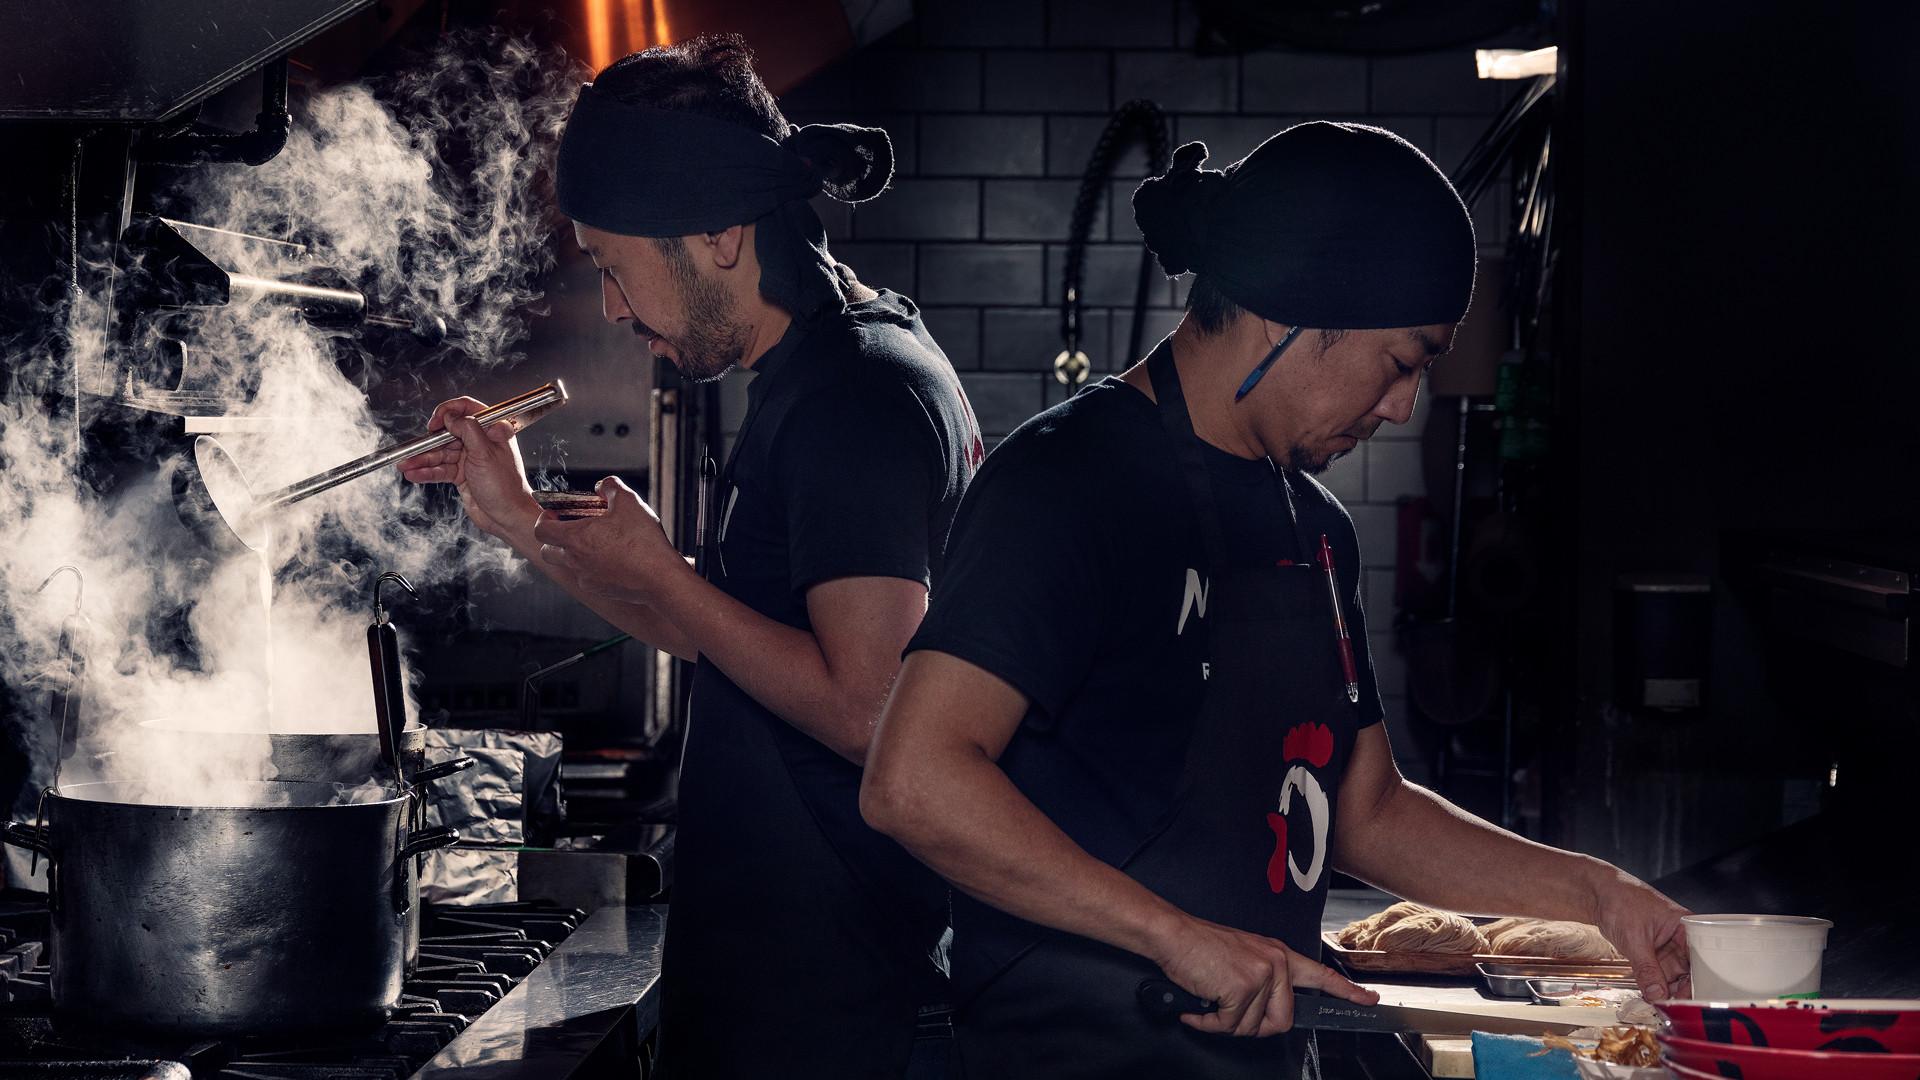 The best ramen in Toronto | Chefs at Midori cooking ramen